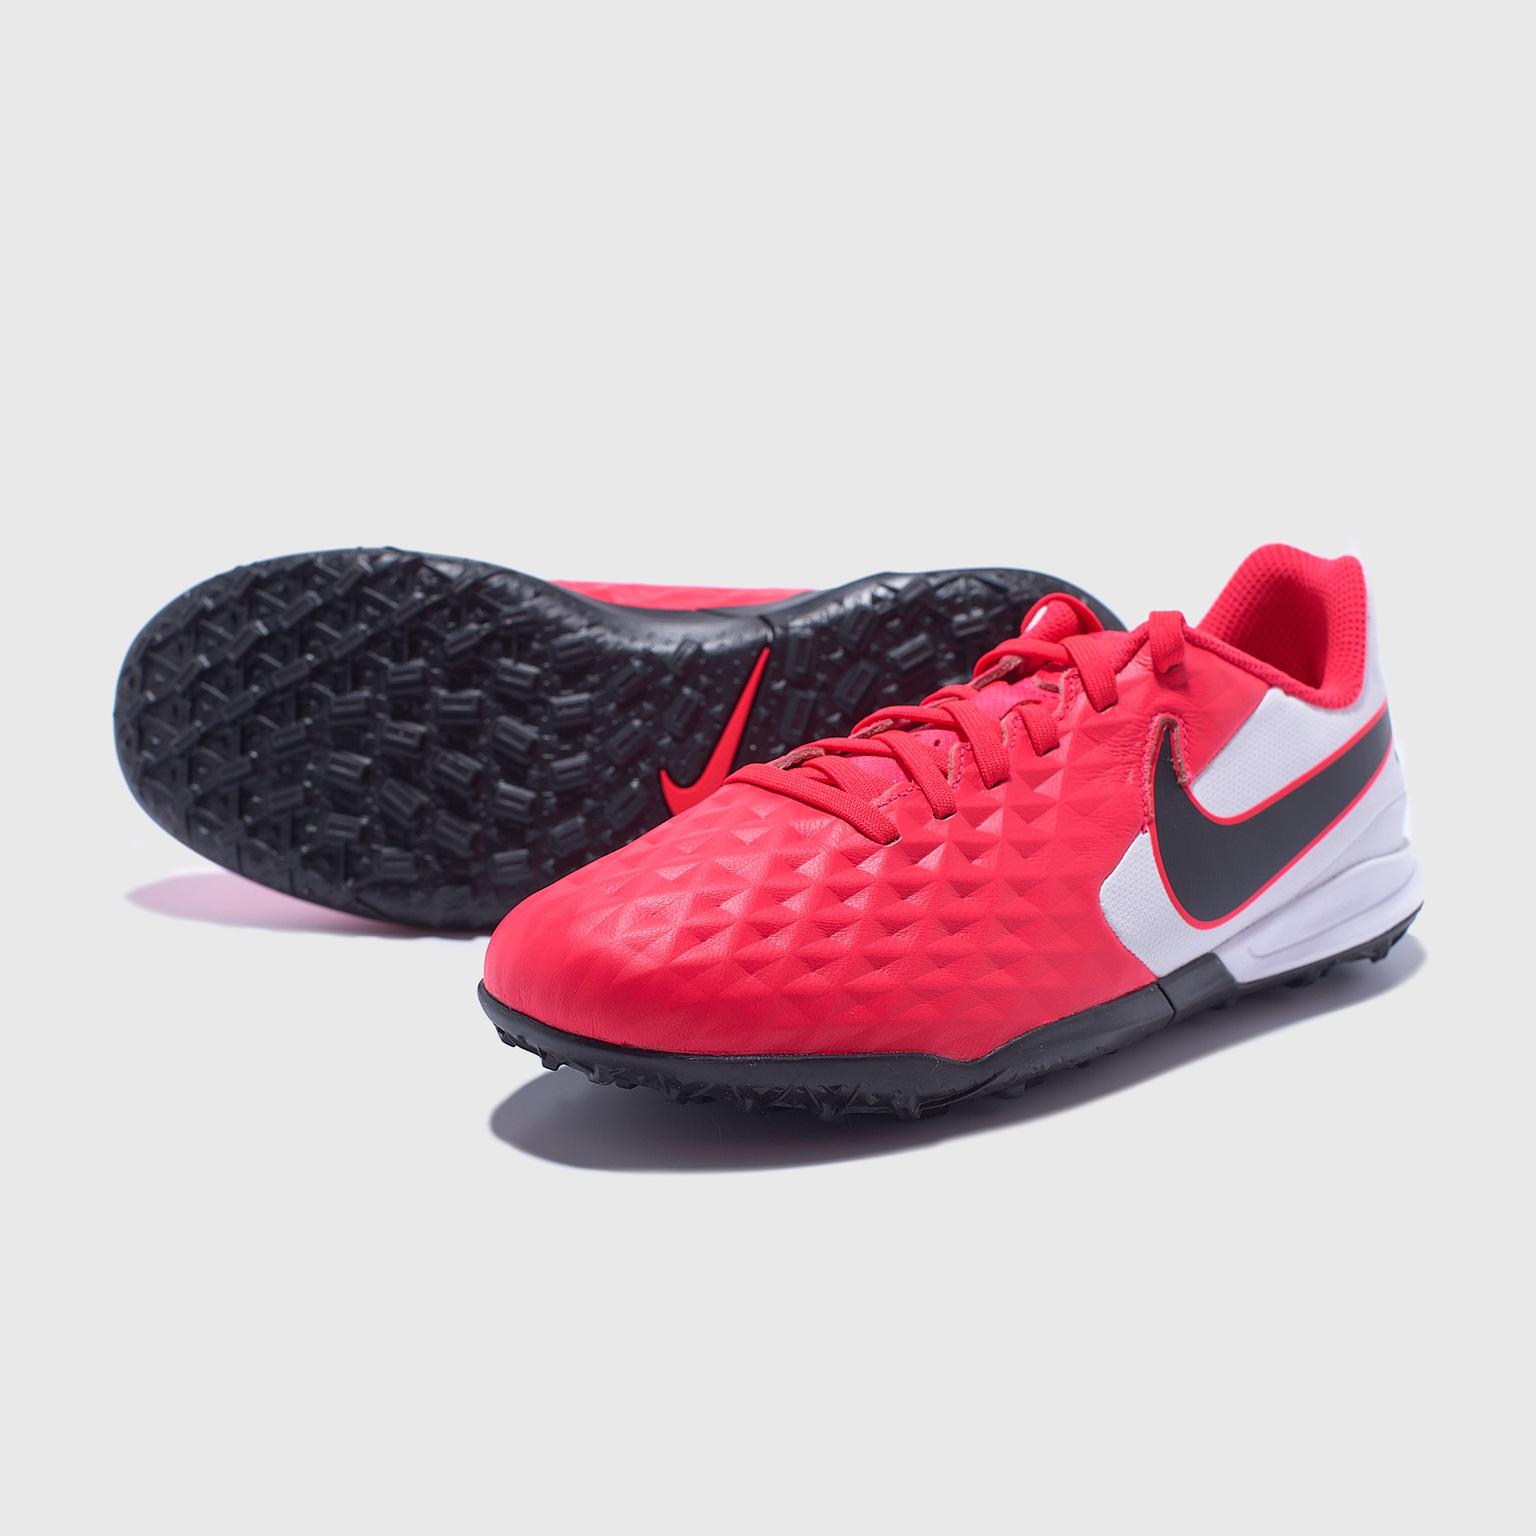 Шиповки детские Nike Legend 8 Academy TF AT5736-606 шиповки детские nike legend 8 academy tf at5736 606